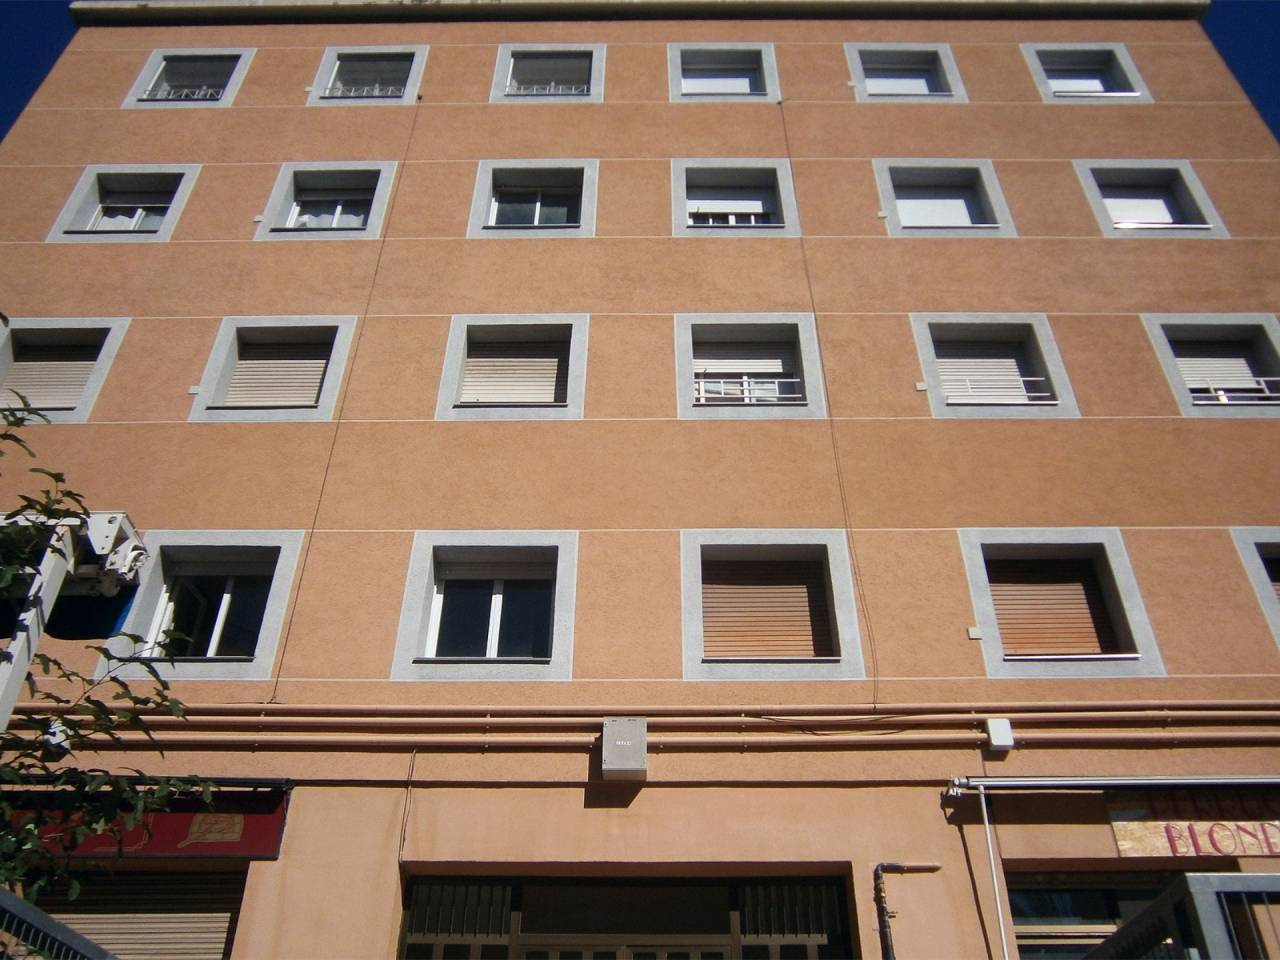 Pis a lloguer Bufalà-Morera-Pomar-Les Guixeres (Badalona)